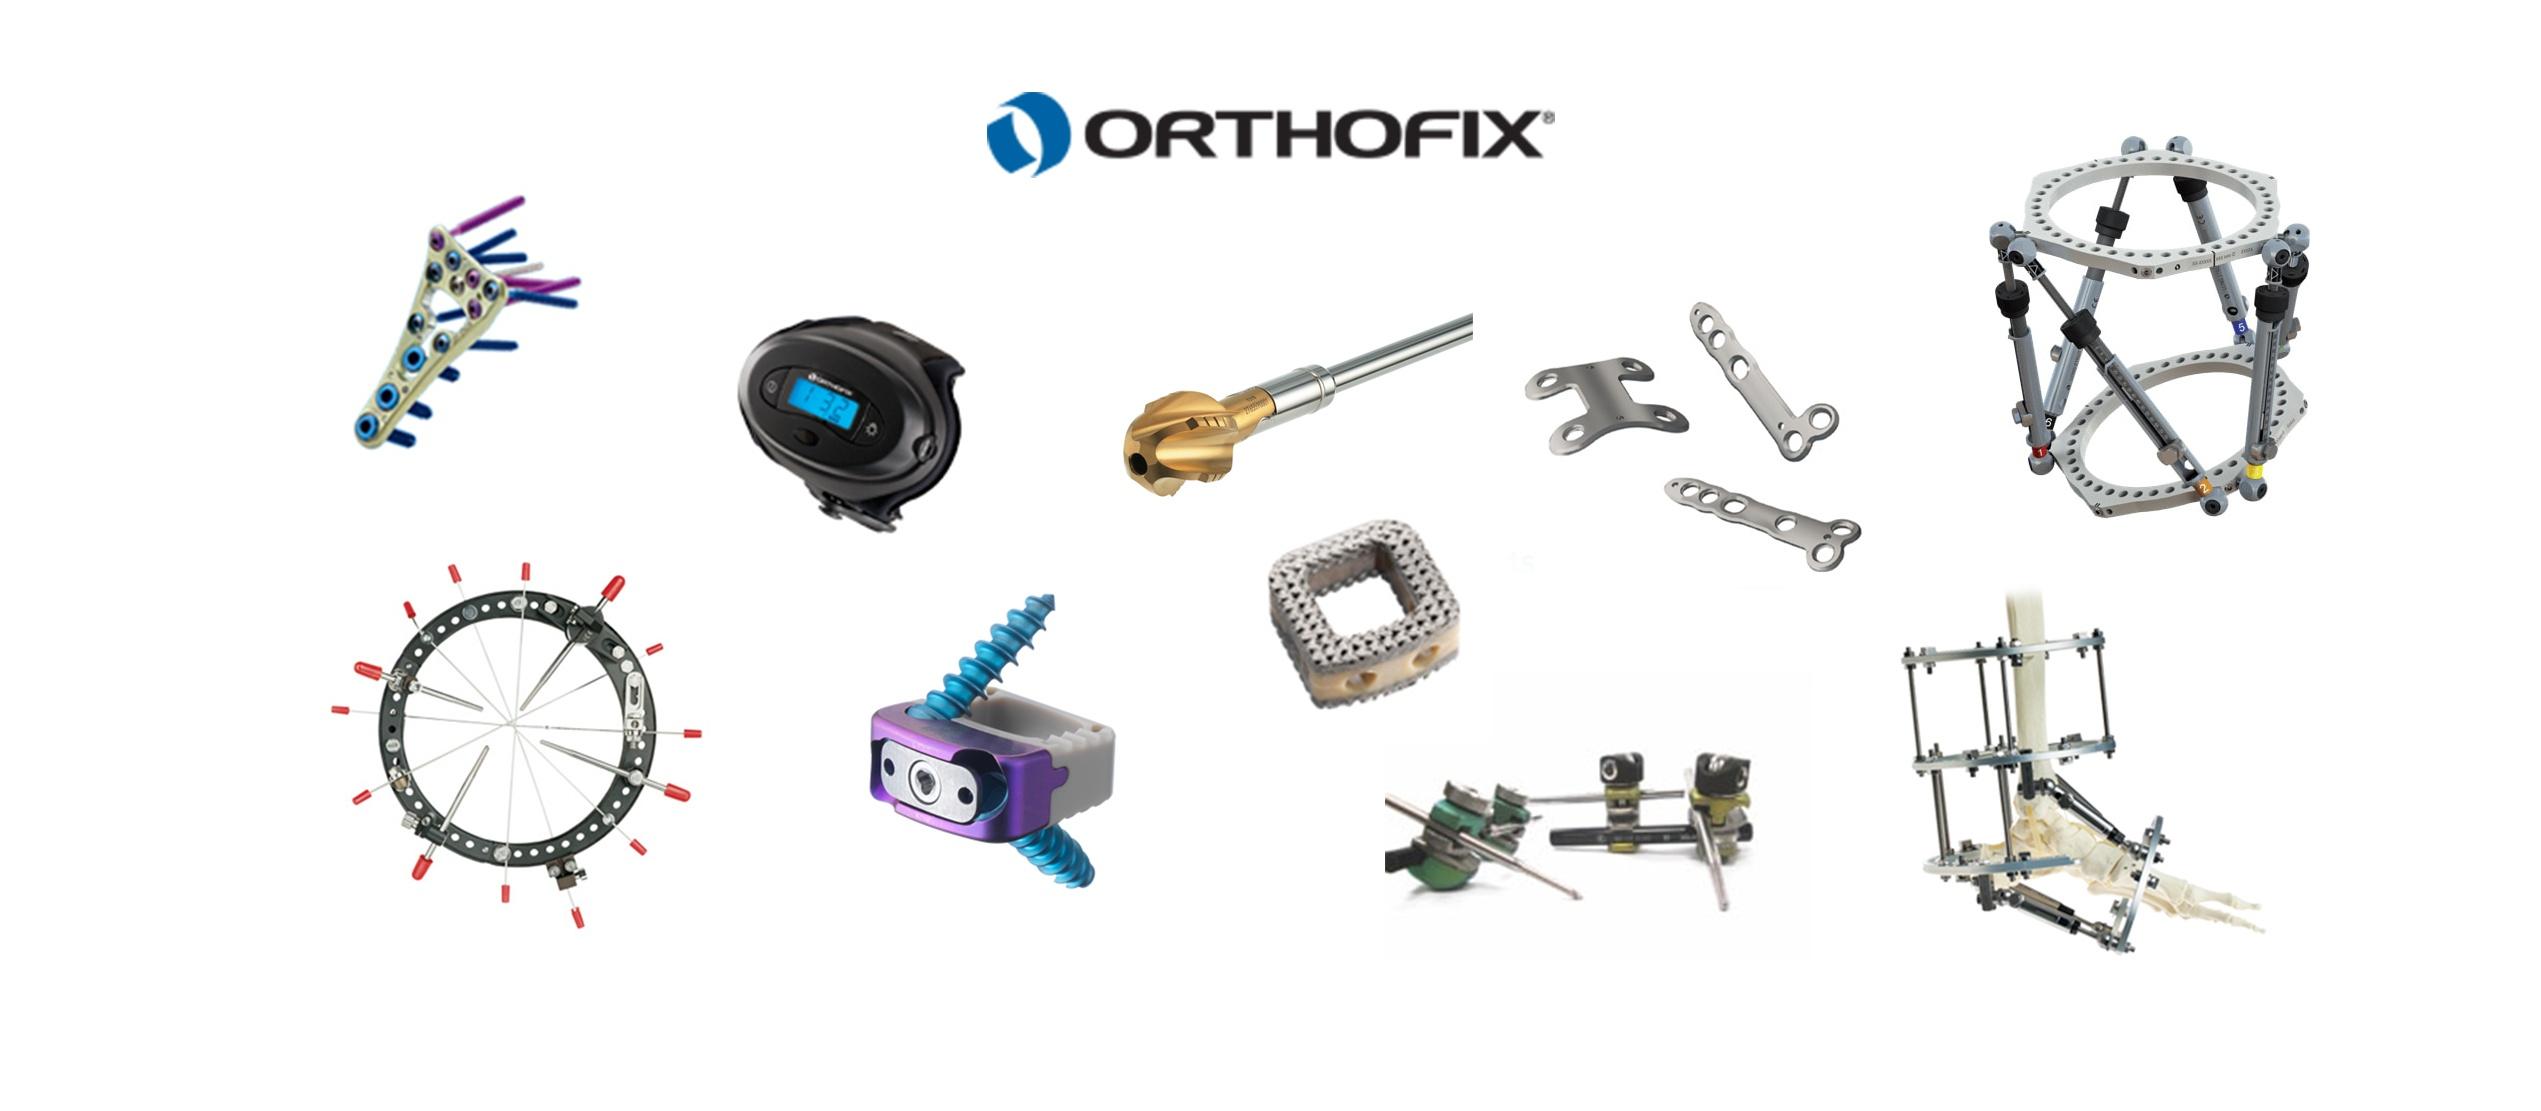 Orthofix_Production_CyberPlan_Cybertec